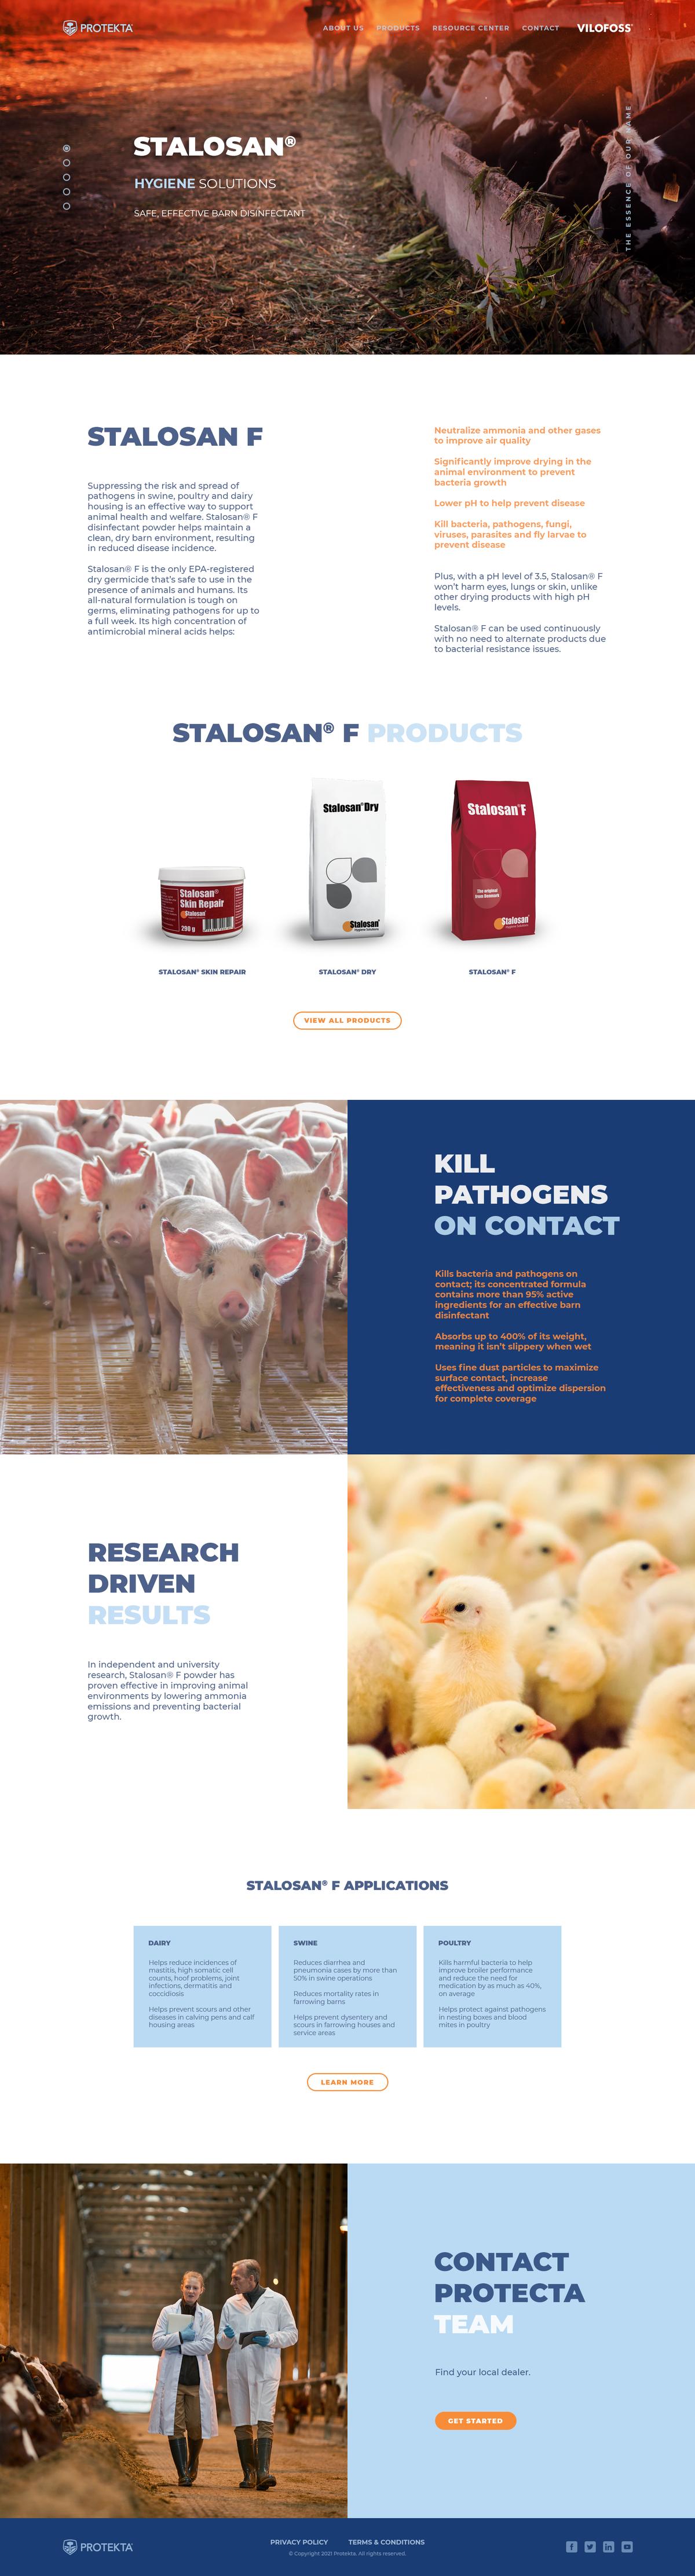 Web page design + expend brand guide (VILOFOSS)